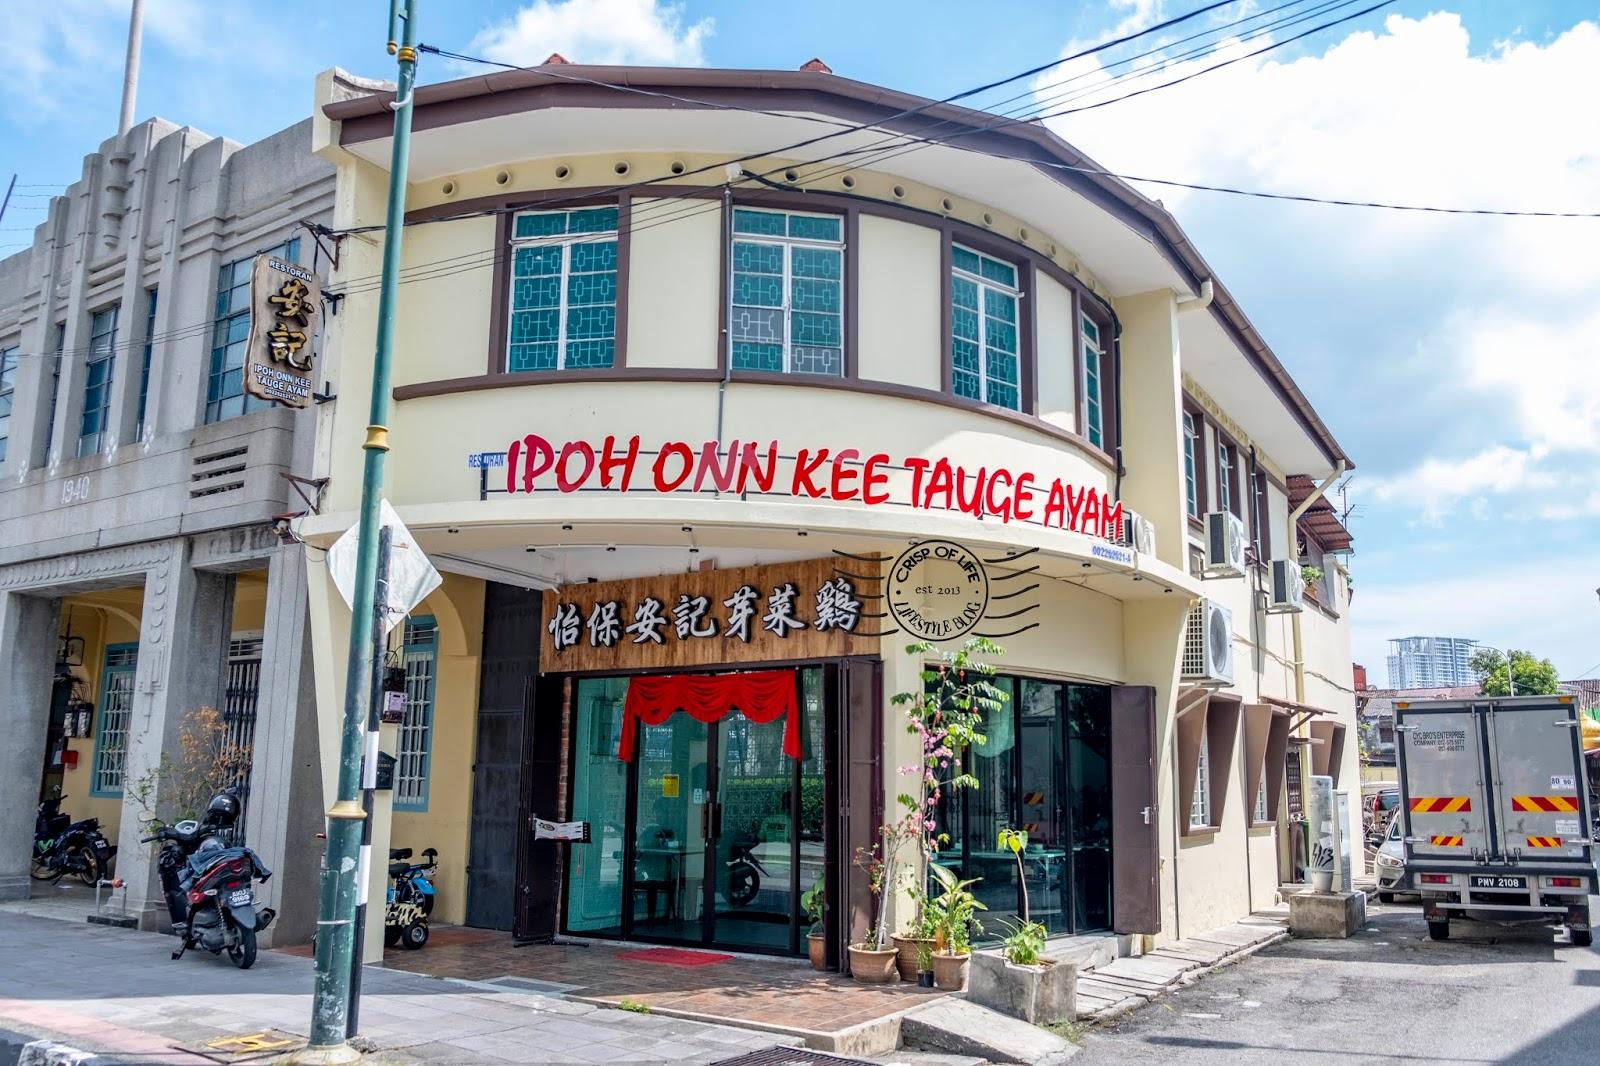 Ipoh Oon Kee Taugeh Ayam 怡宝安记芽菜鸡 at Lebuh Acheh, Georgetown, Penang